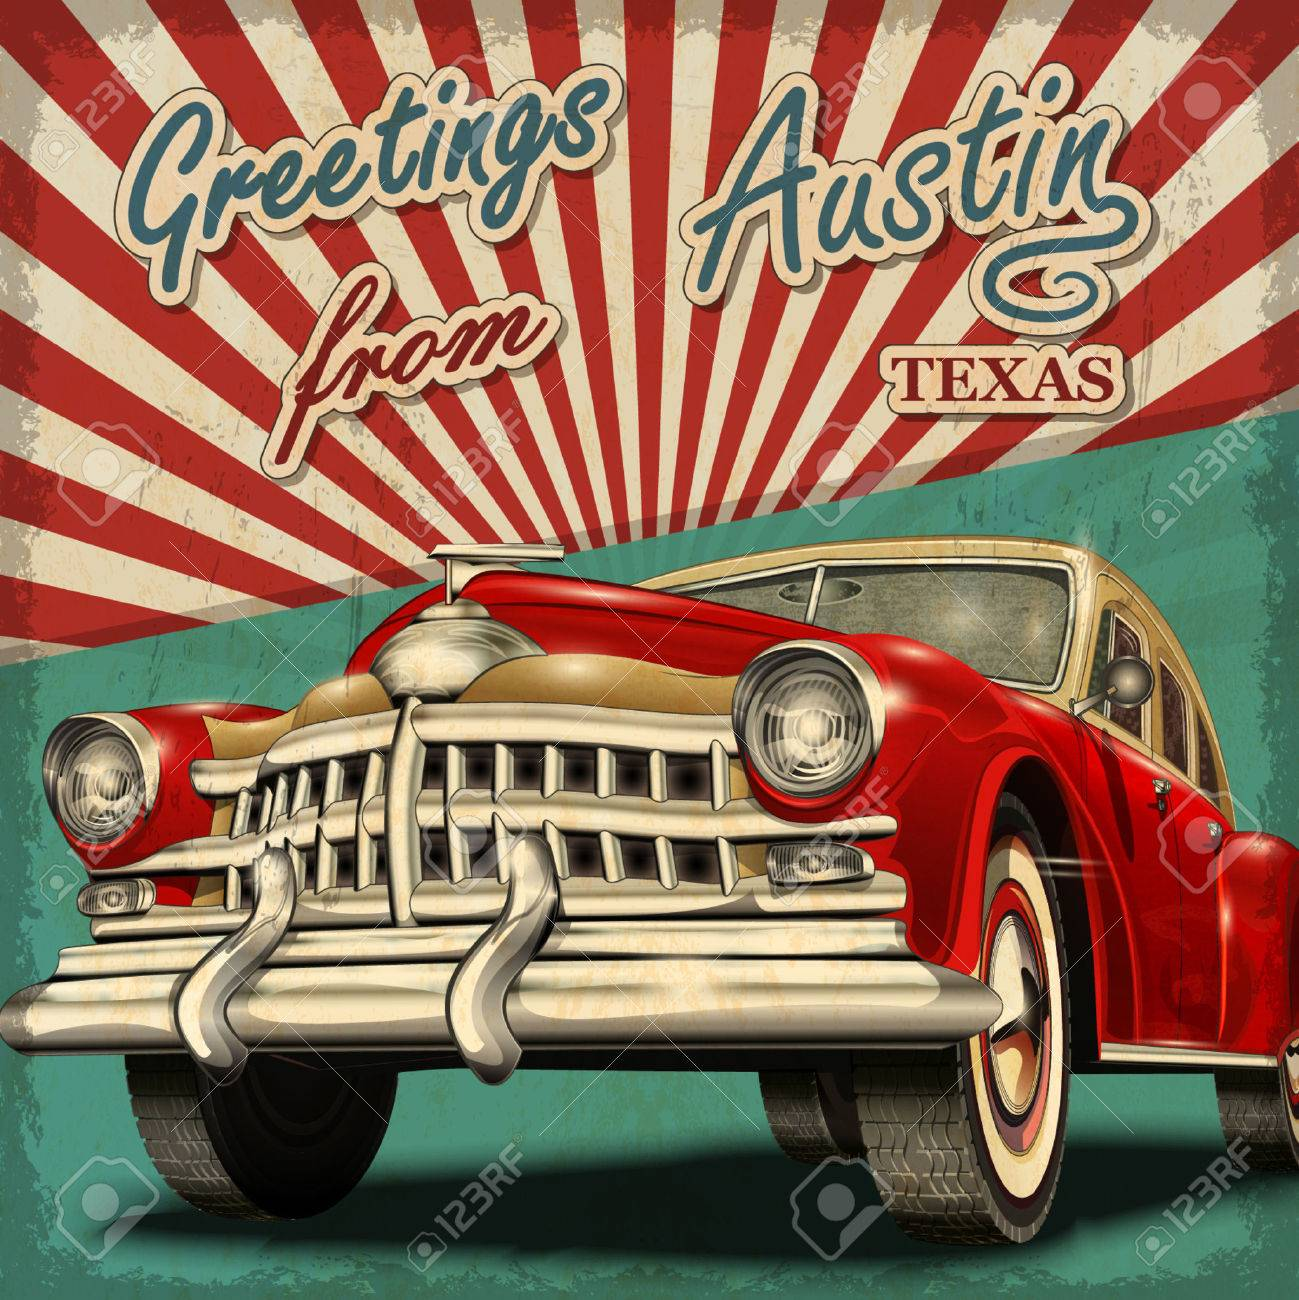 Vintage touristic greeting card with retro car.Austin.Texas. - 54500659